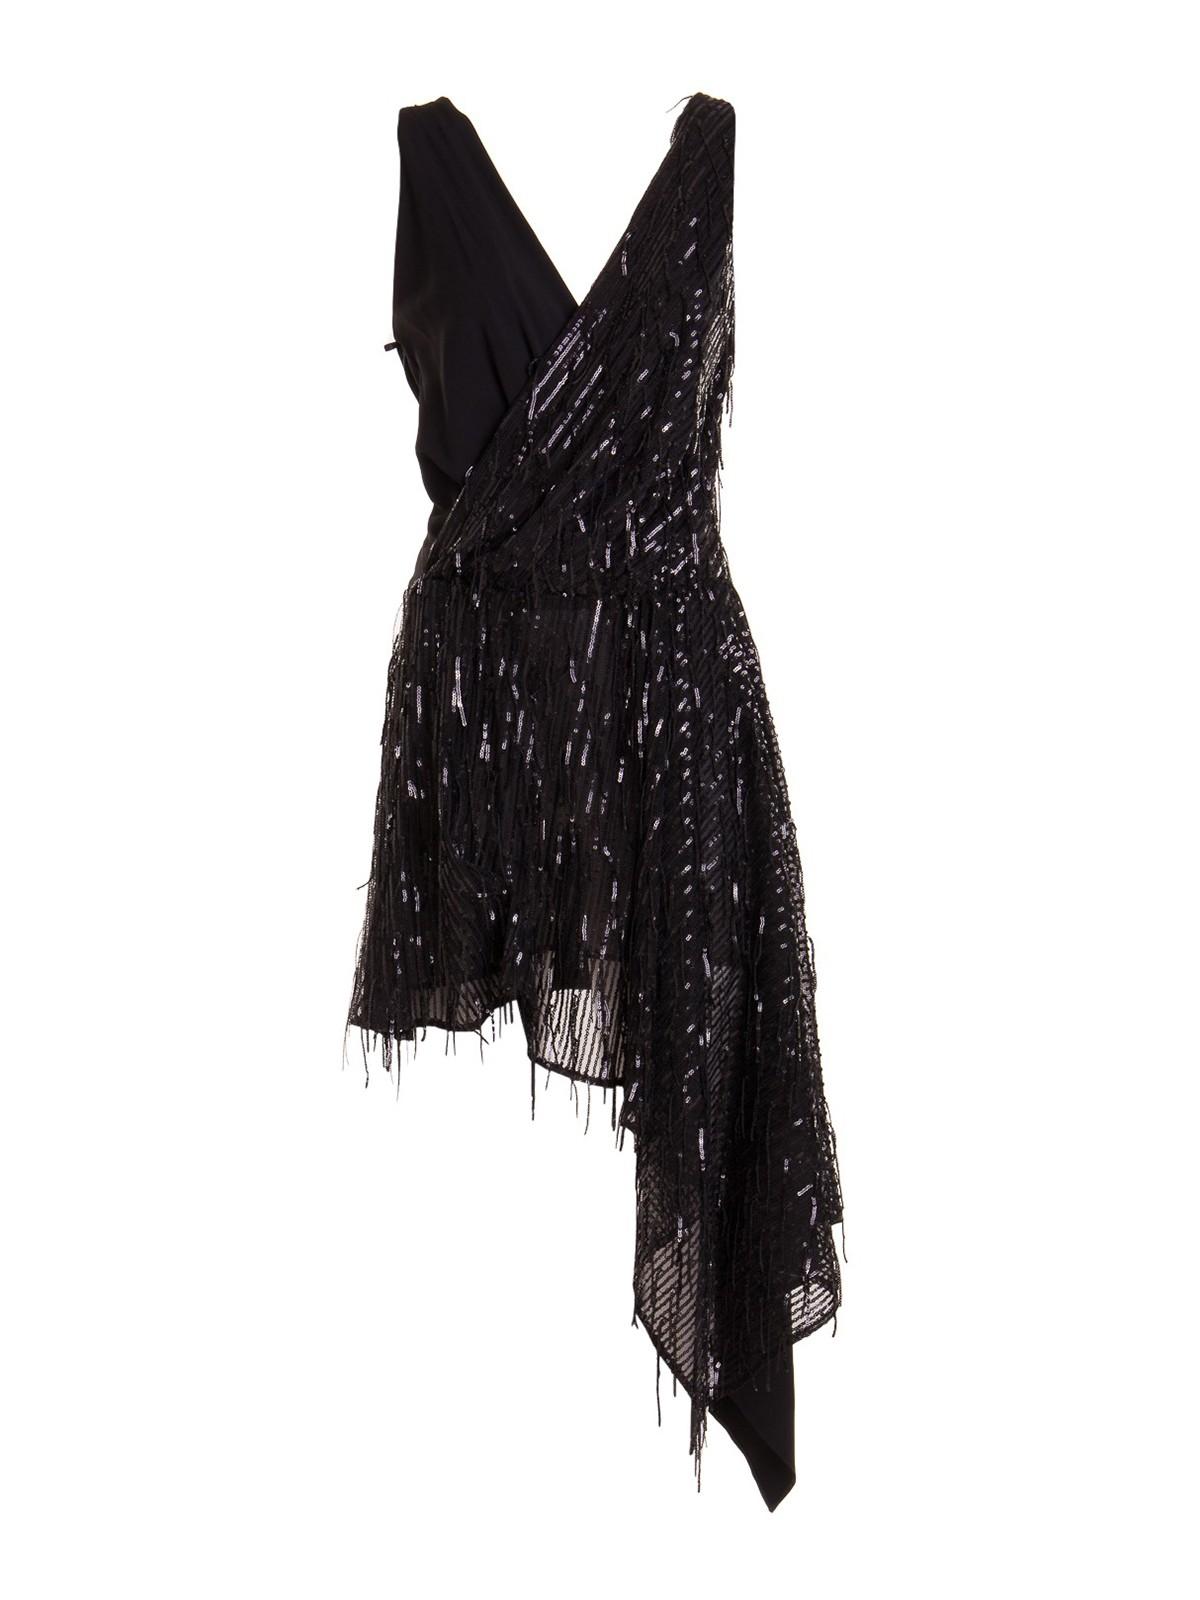 Just Cavalli SEQUINED ASYMMETRIC DRESS